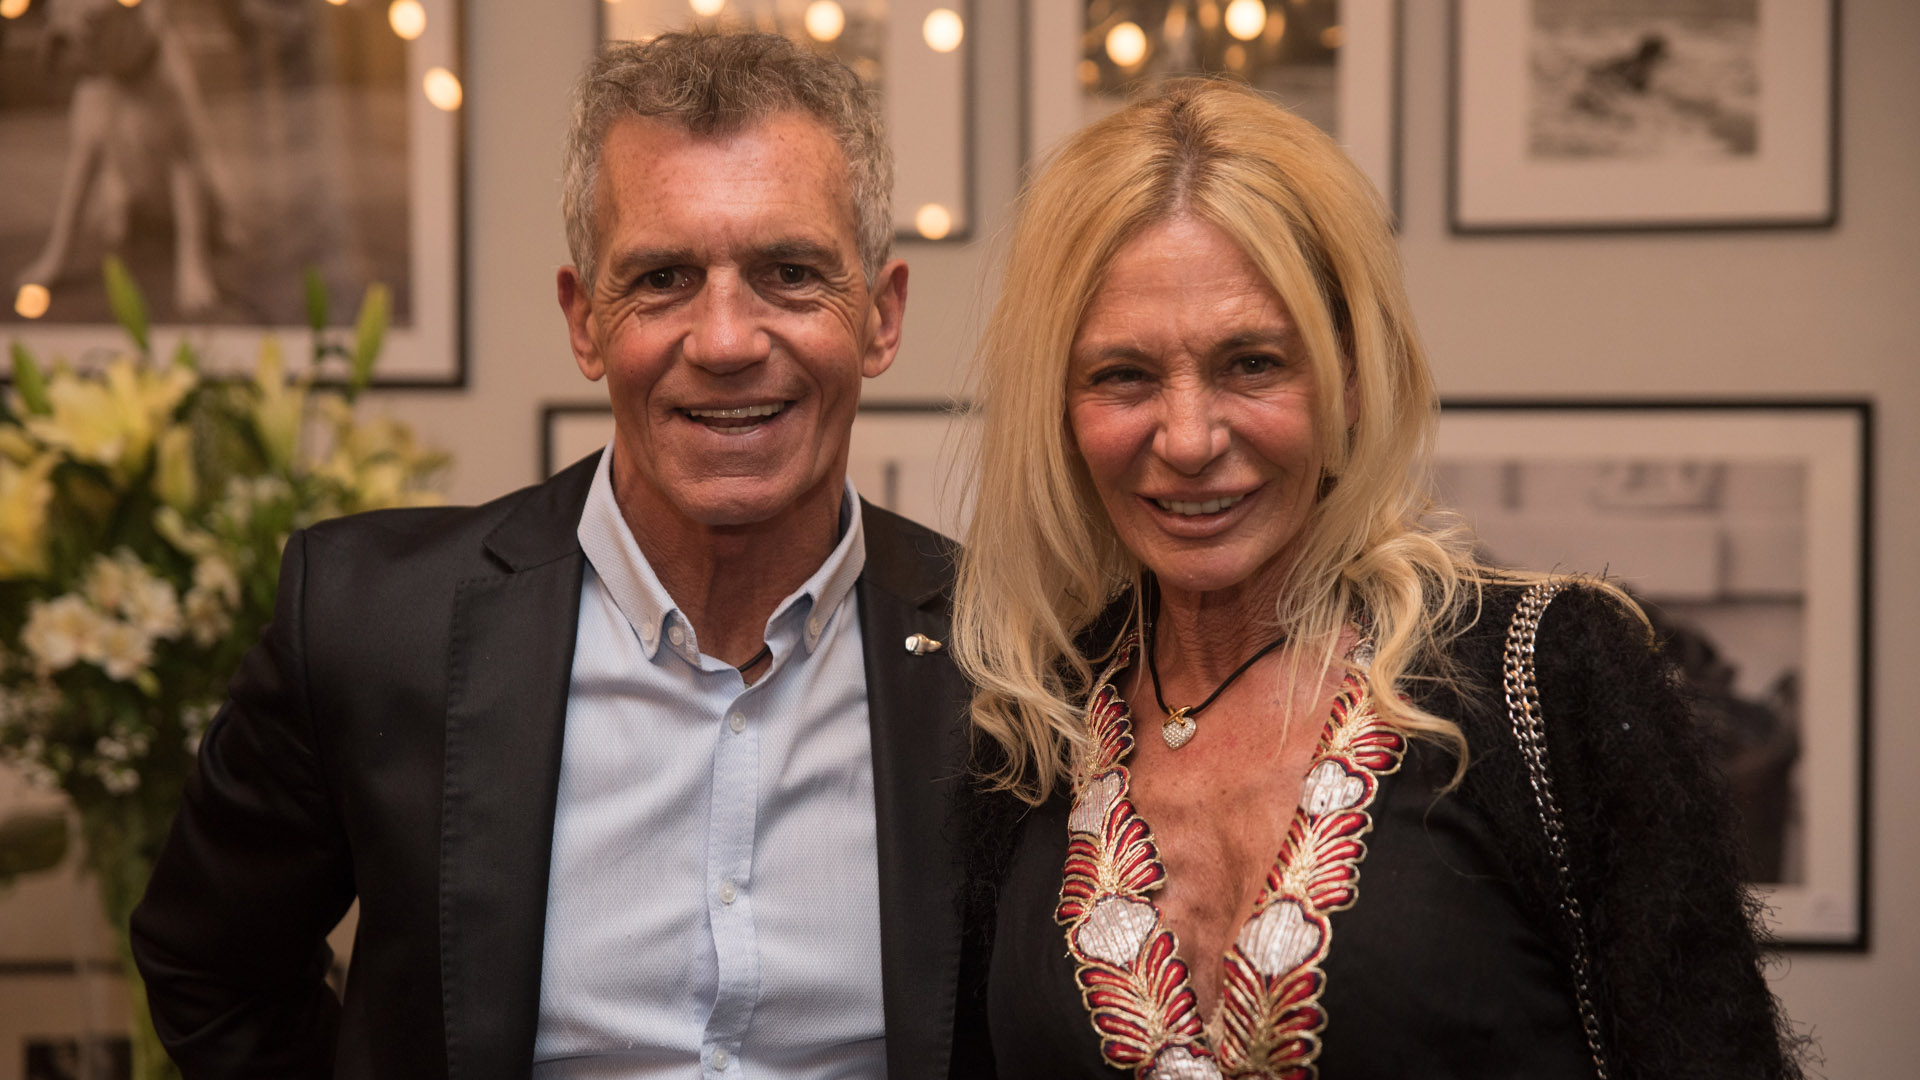 Ricardo Piñeiro y Claudia Gemelli